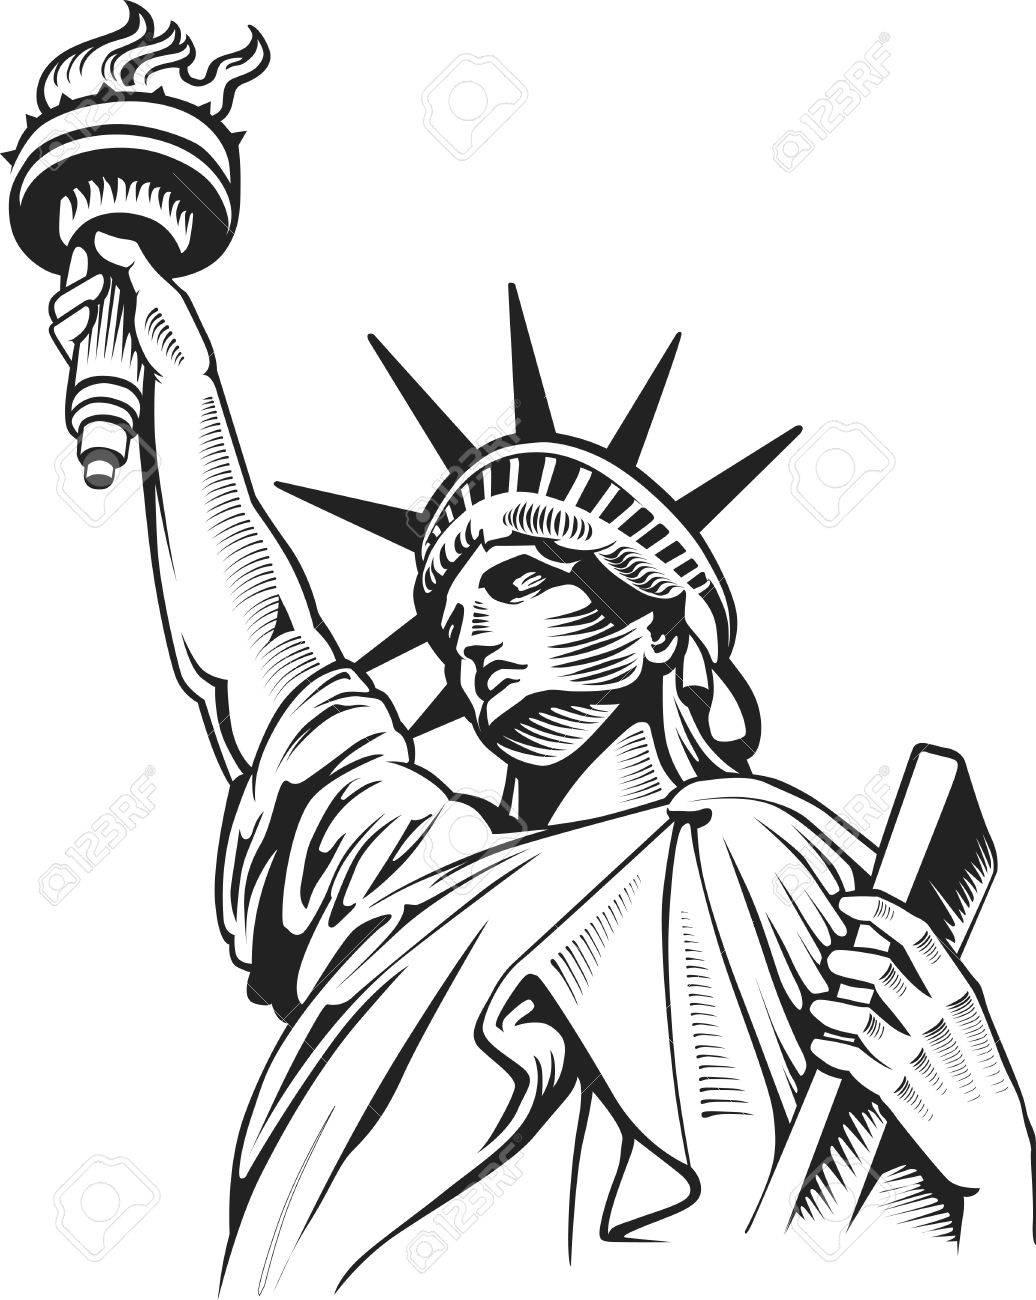 1036x1300 Liberty Statue, New York, Usa Royalty Free Cliparts, Vectors,